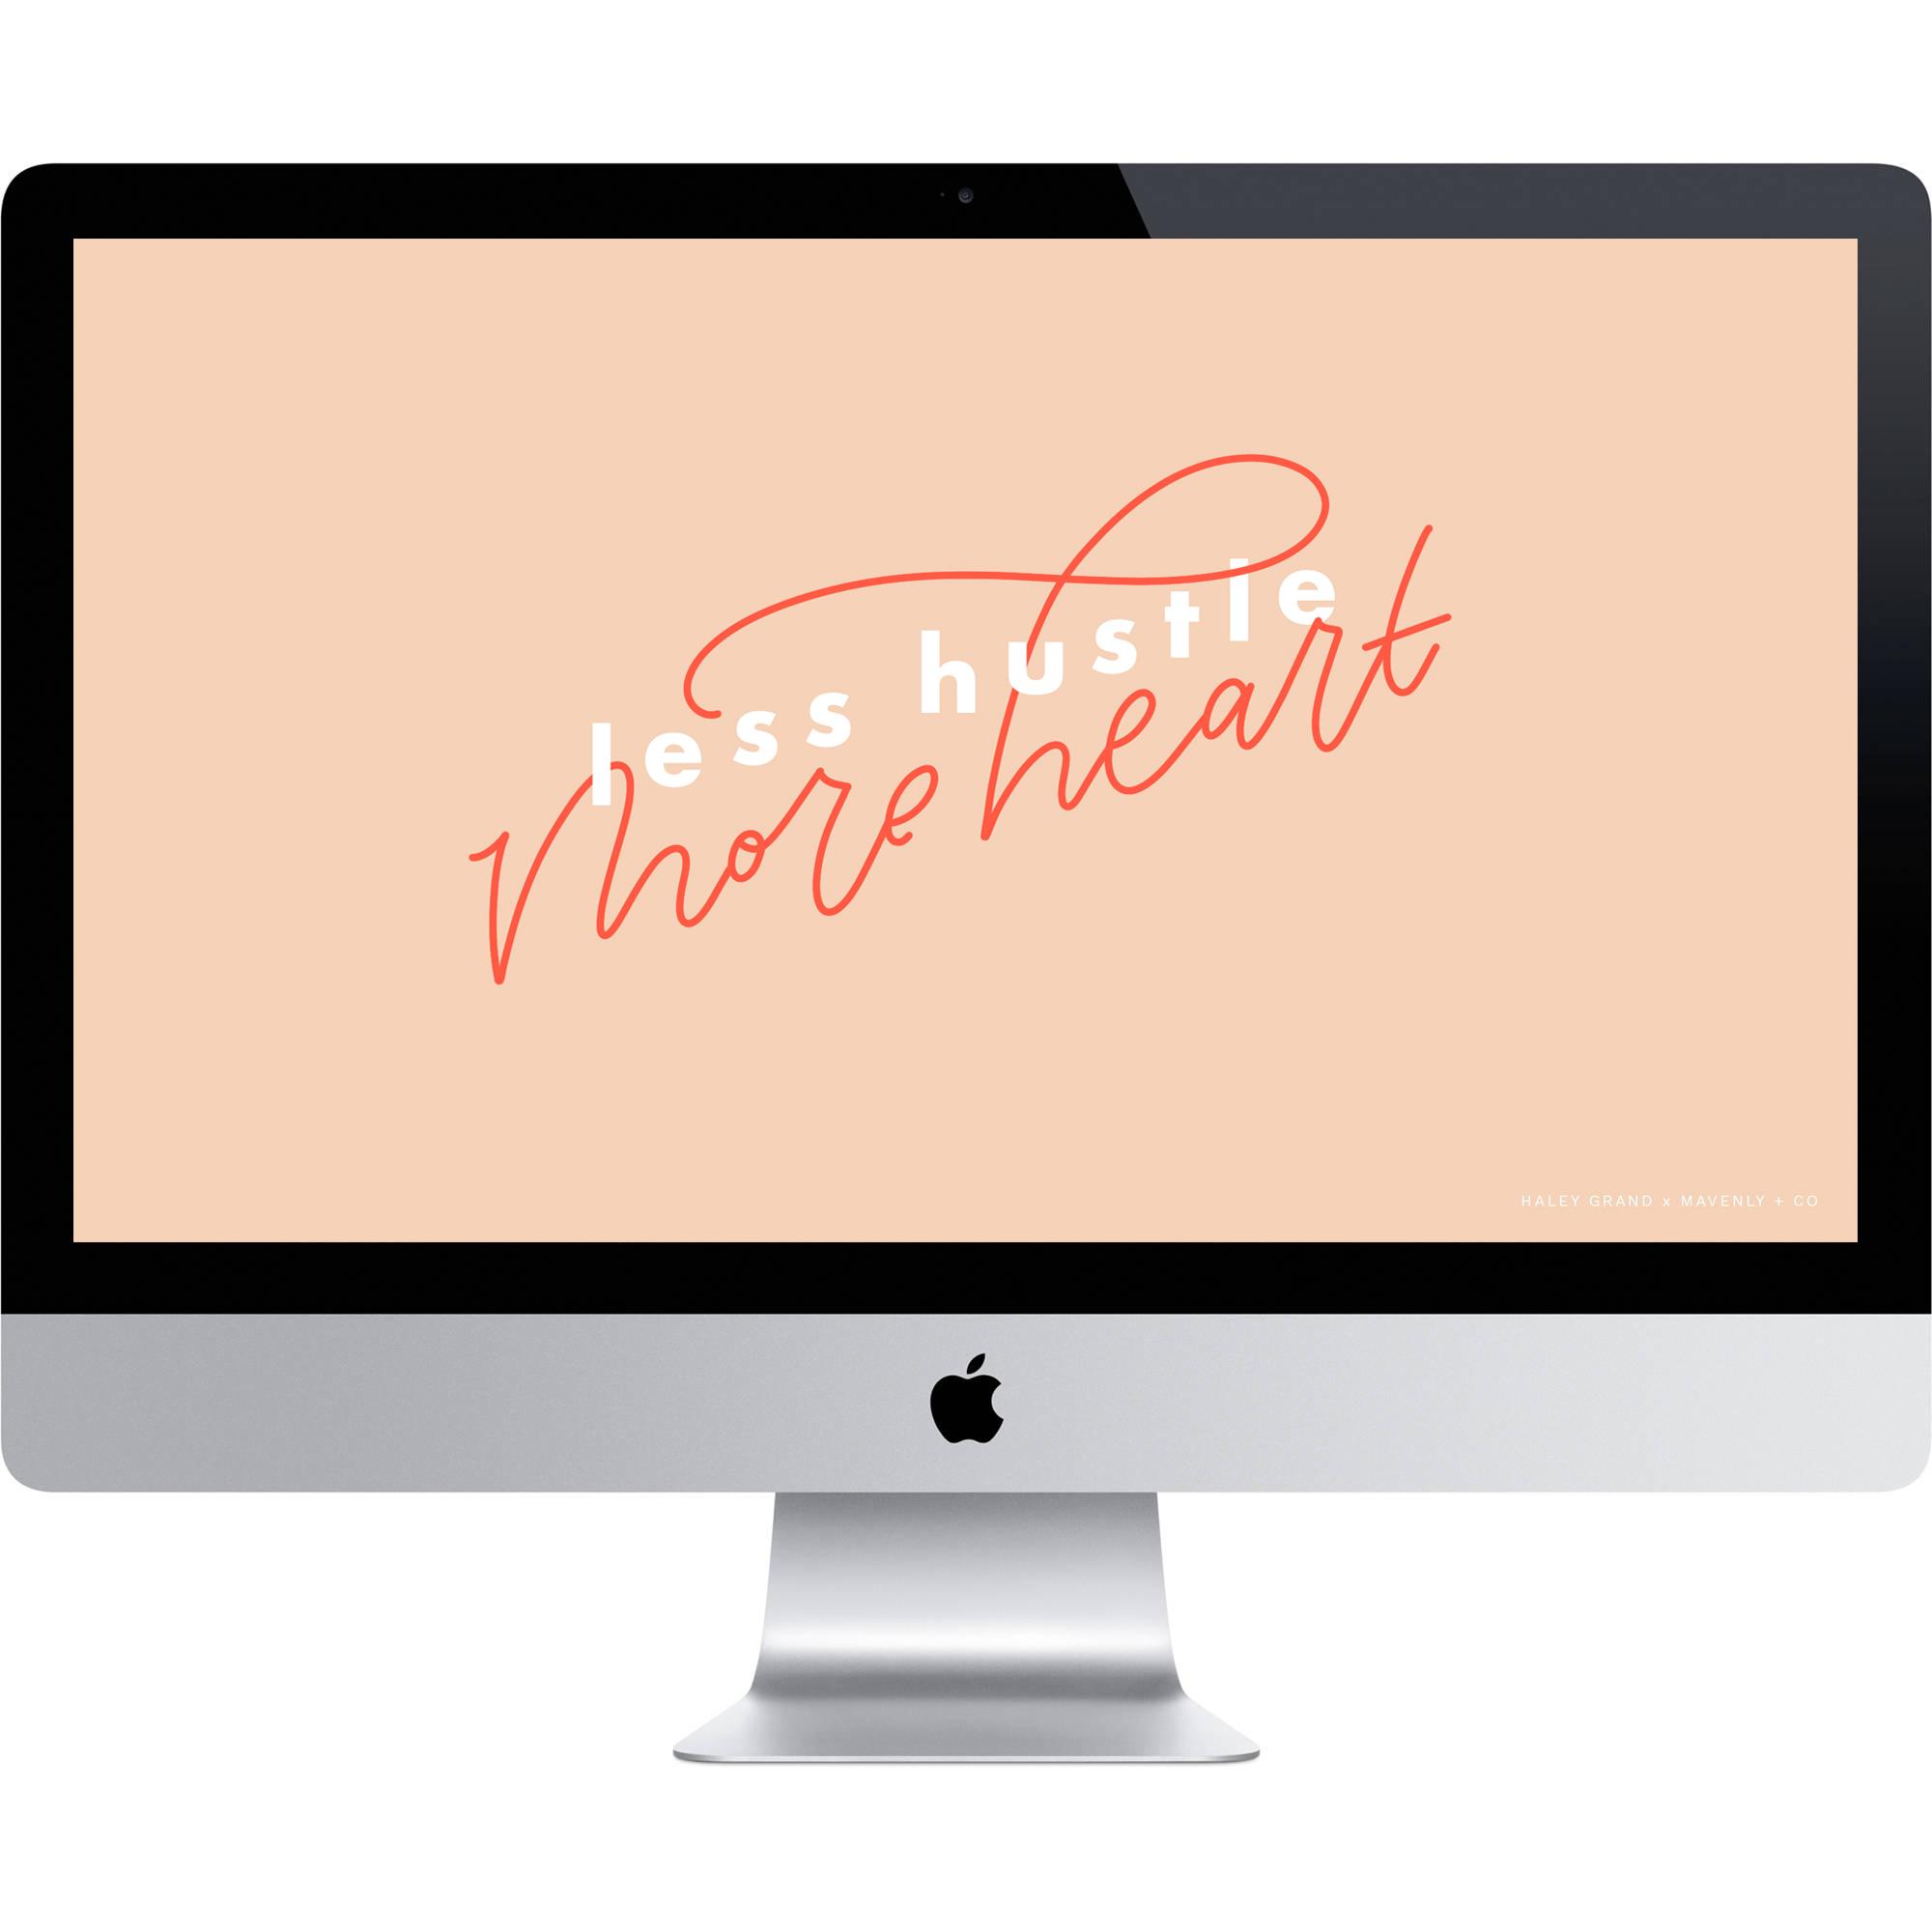 Less Hustle More Heart Wallpaper Download.jpg